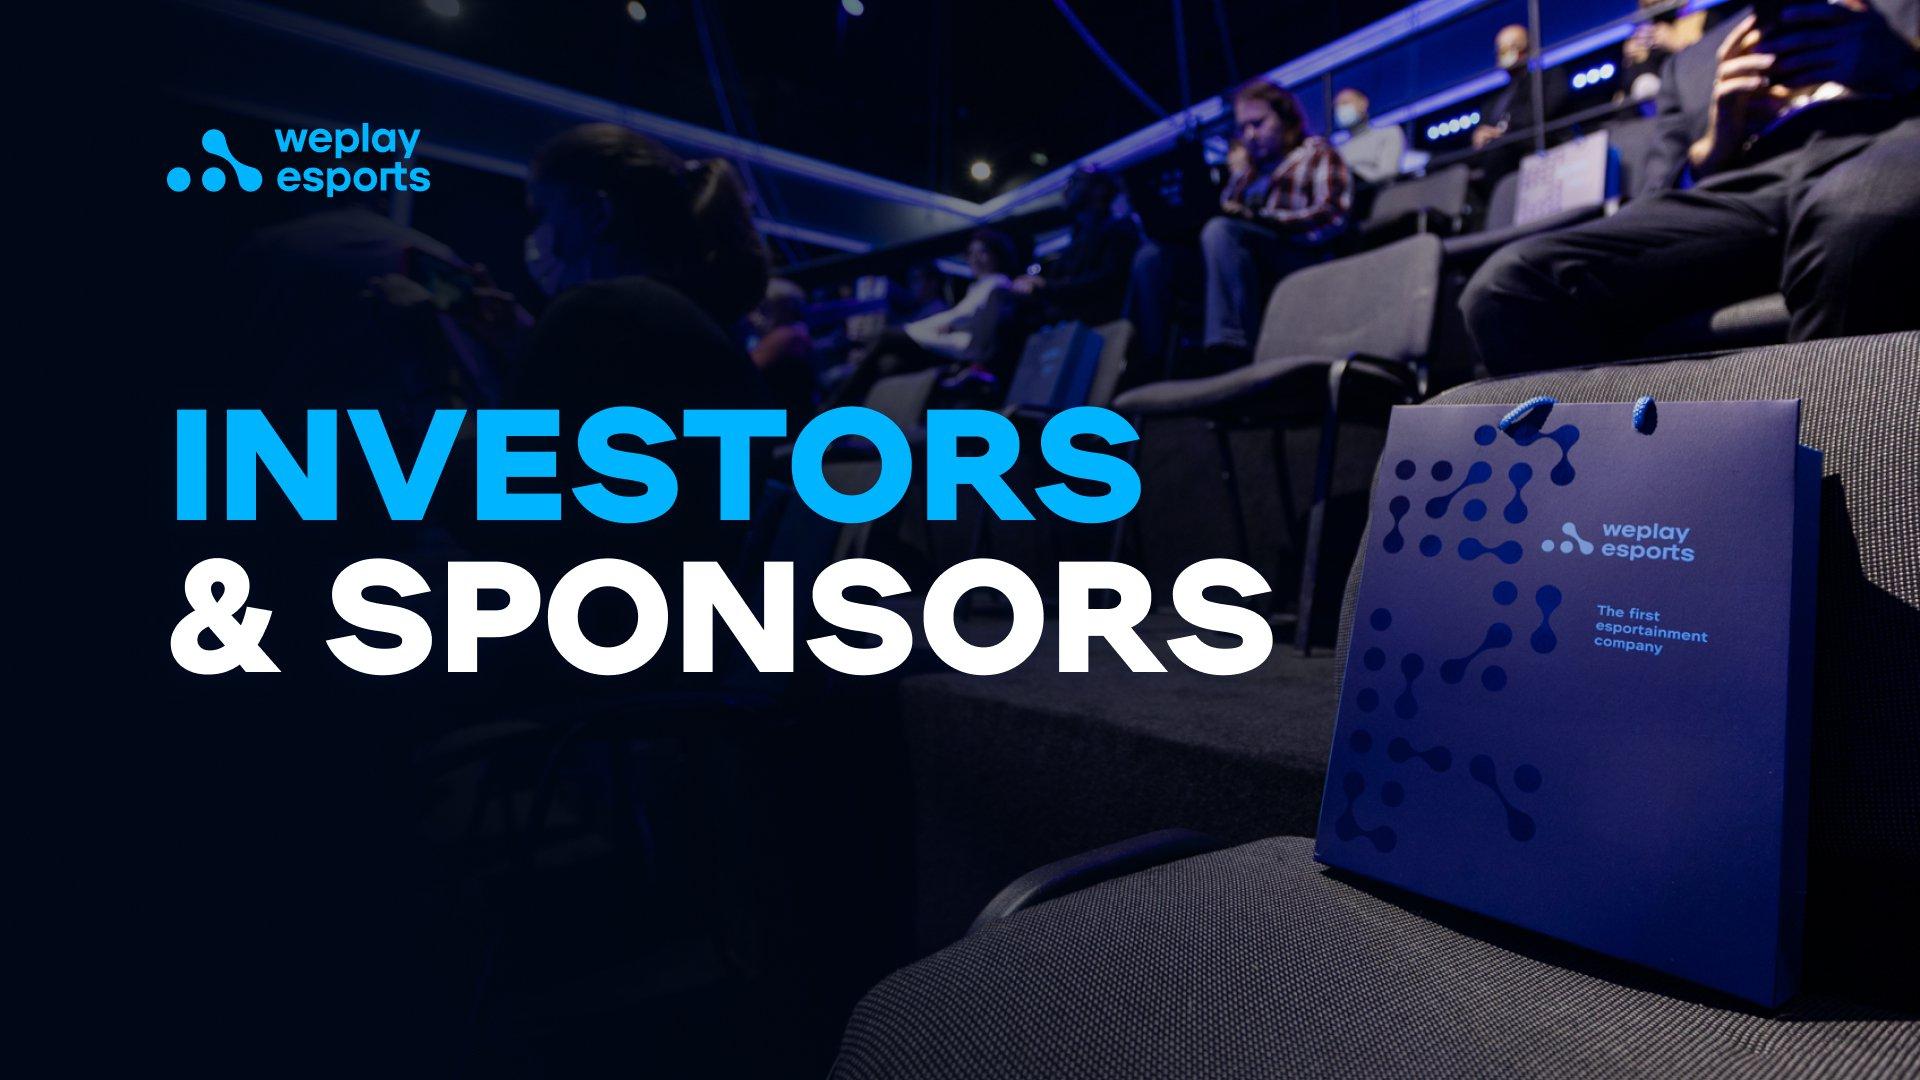 Investor/Sponsor